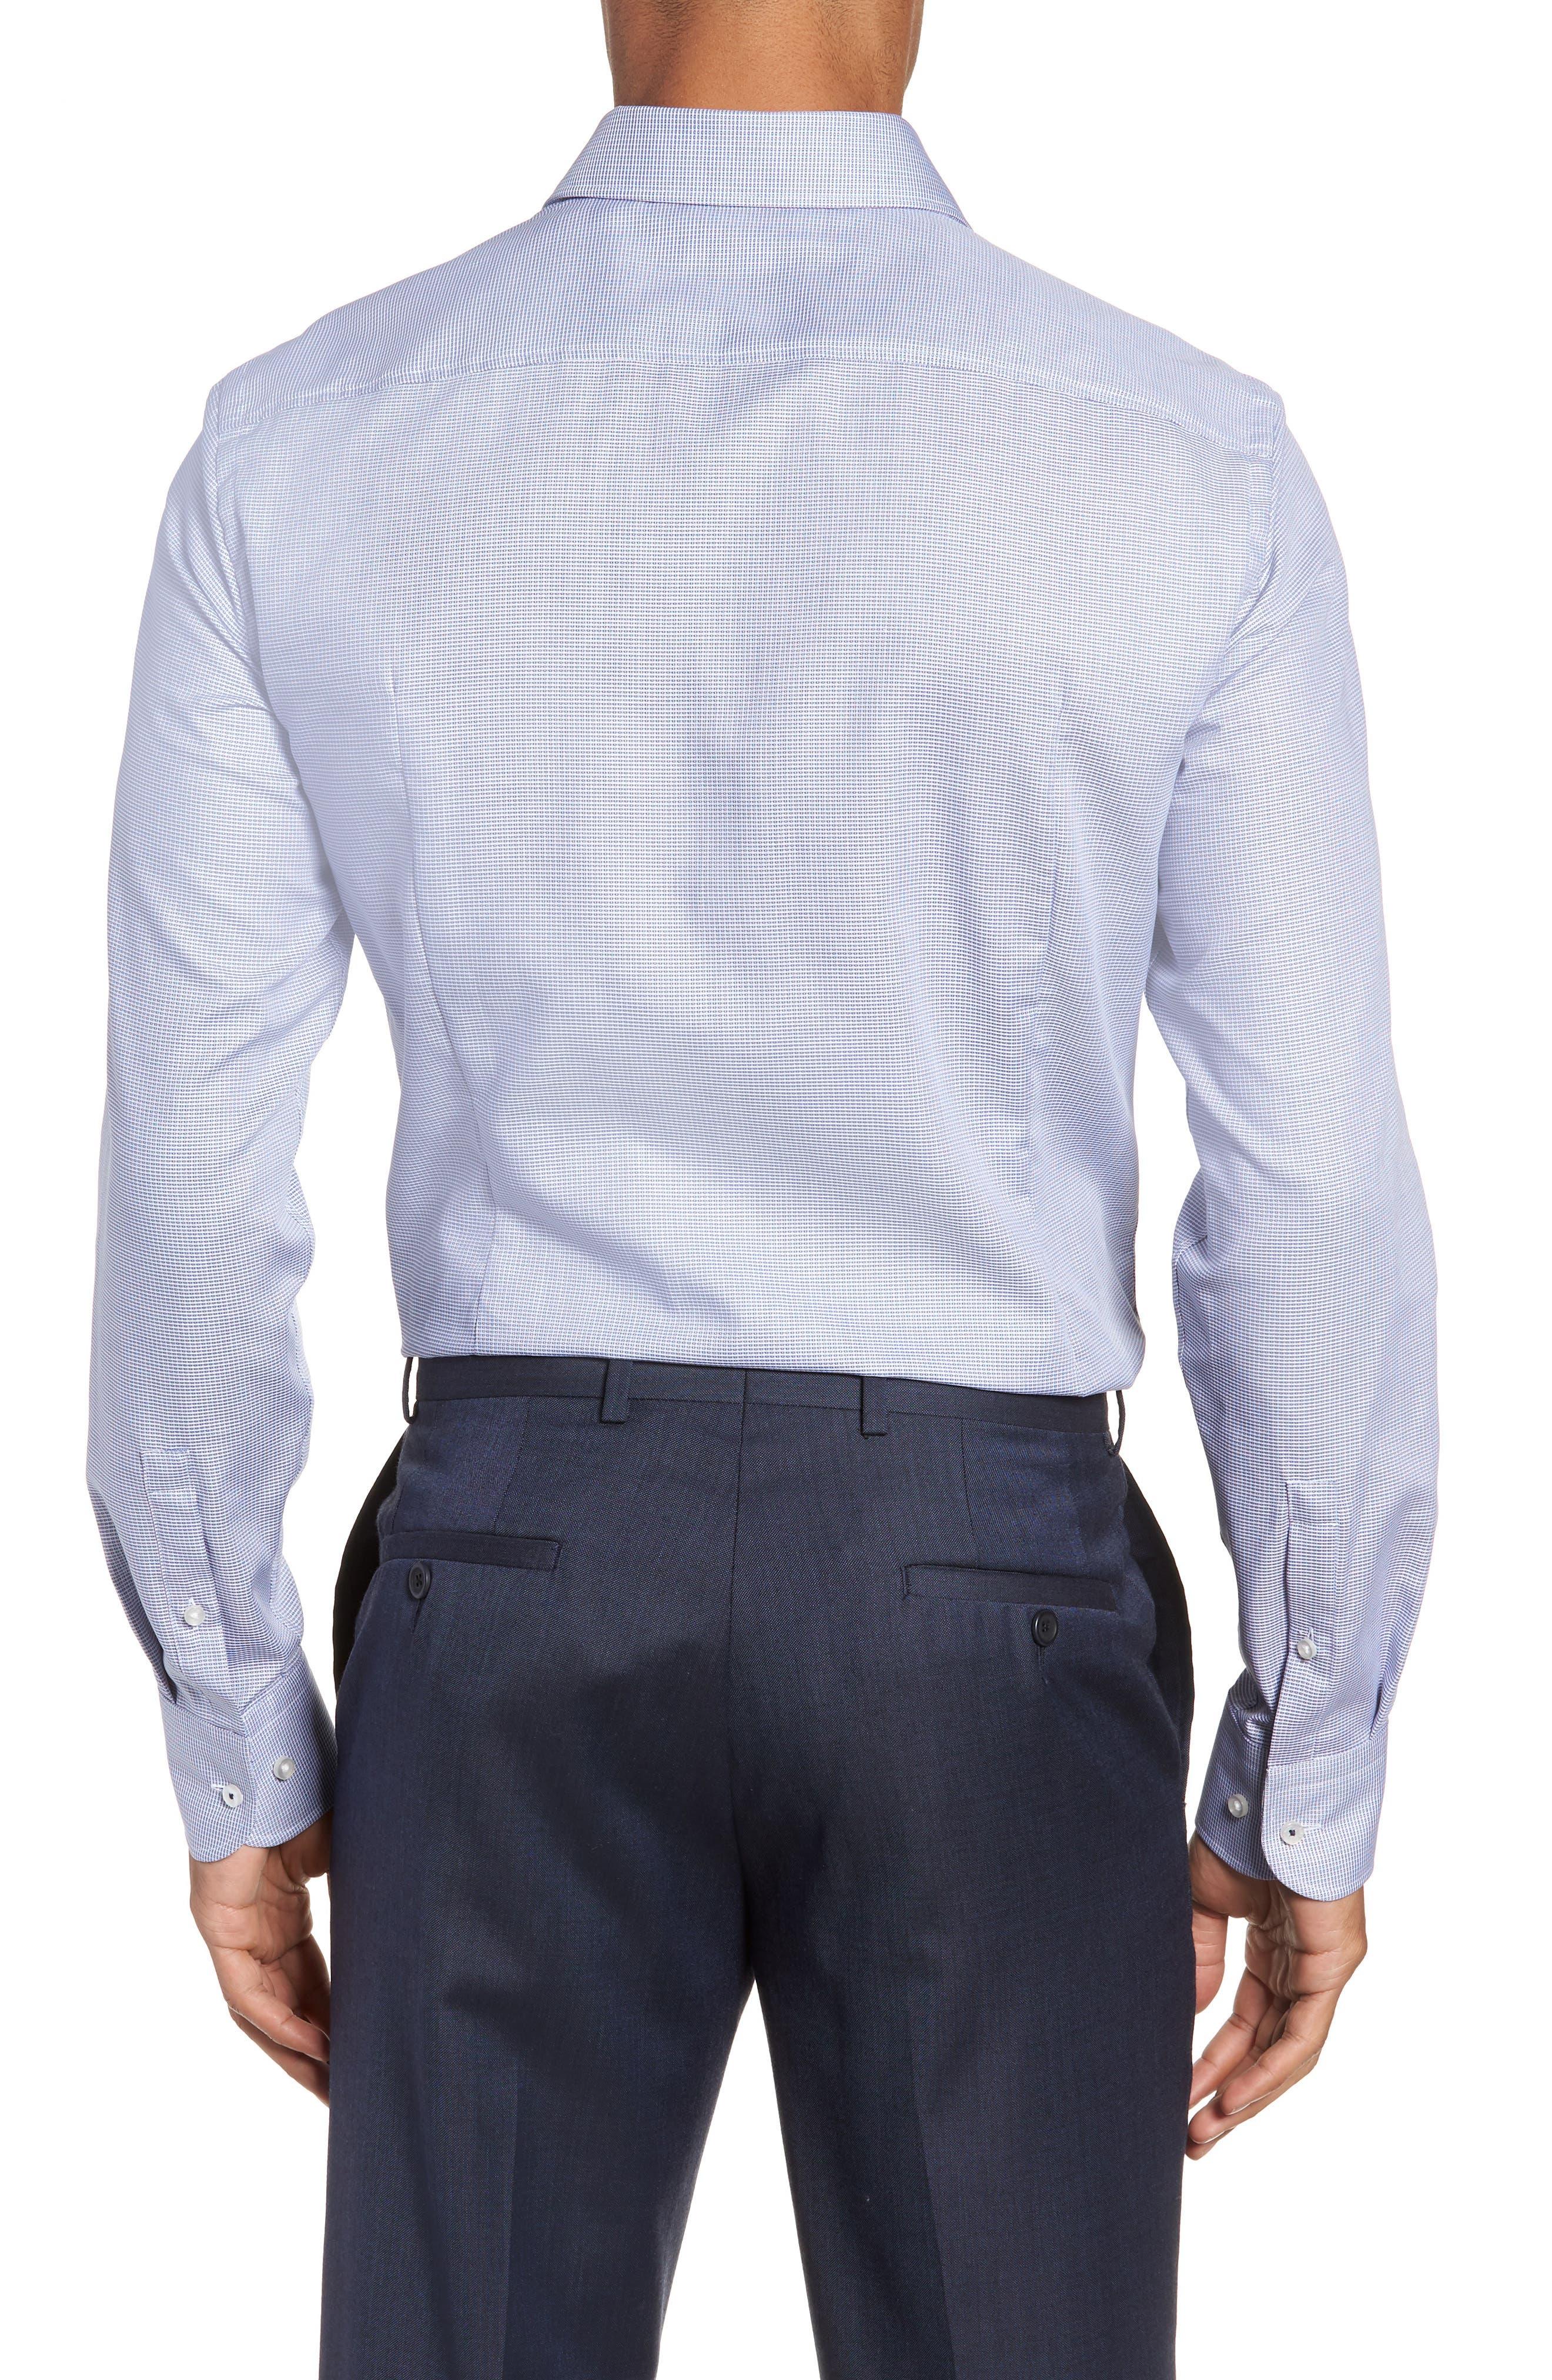 x Nordstrom Jerrin Slim Fit Solid Dress Shirt,                             Alternate thumbnail 3, color,                             BLUE